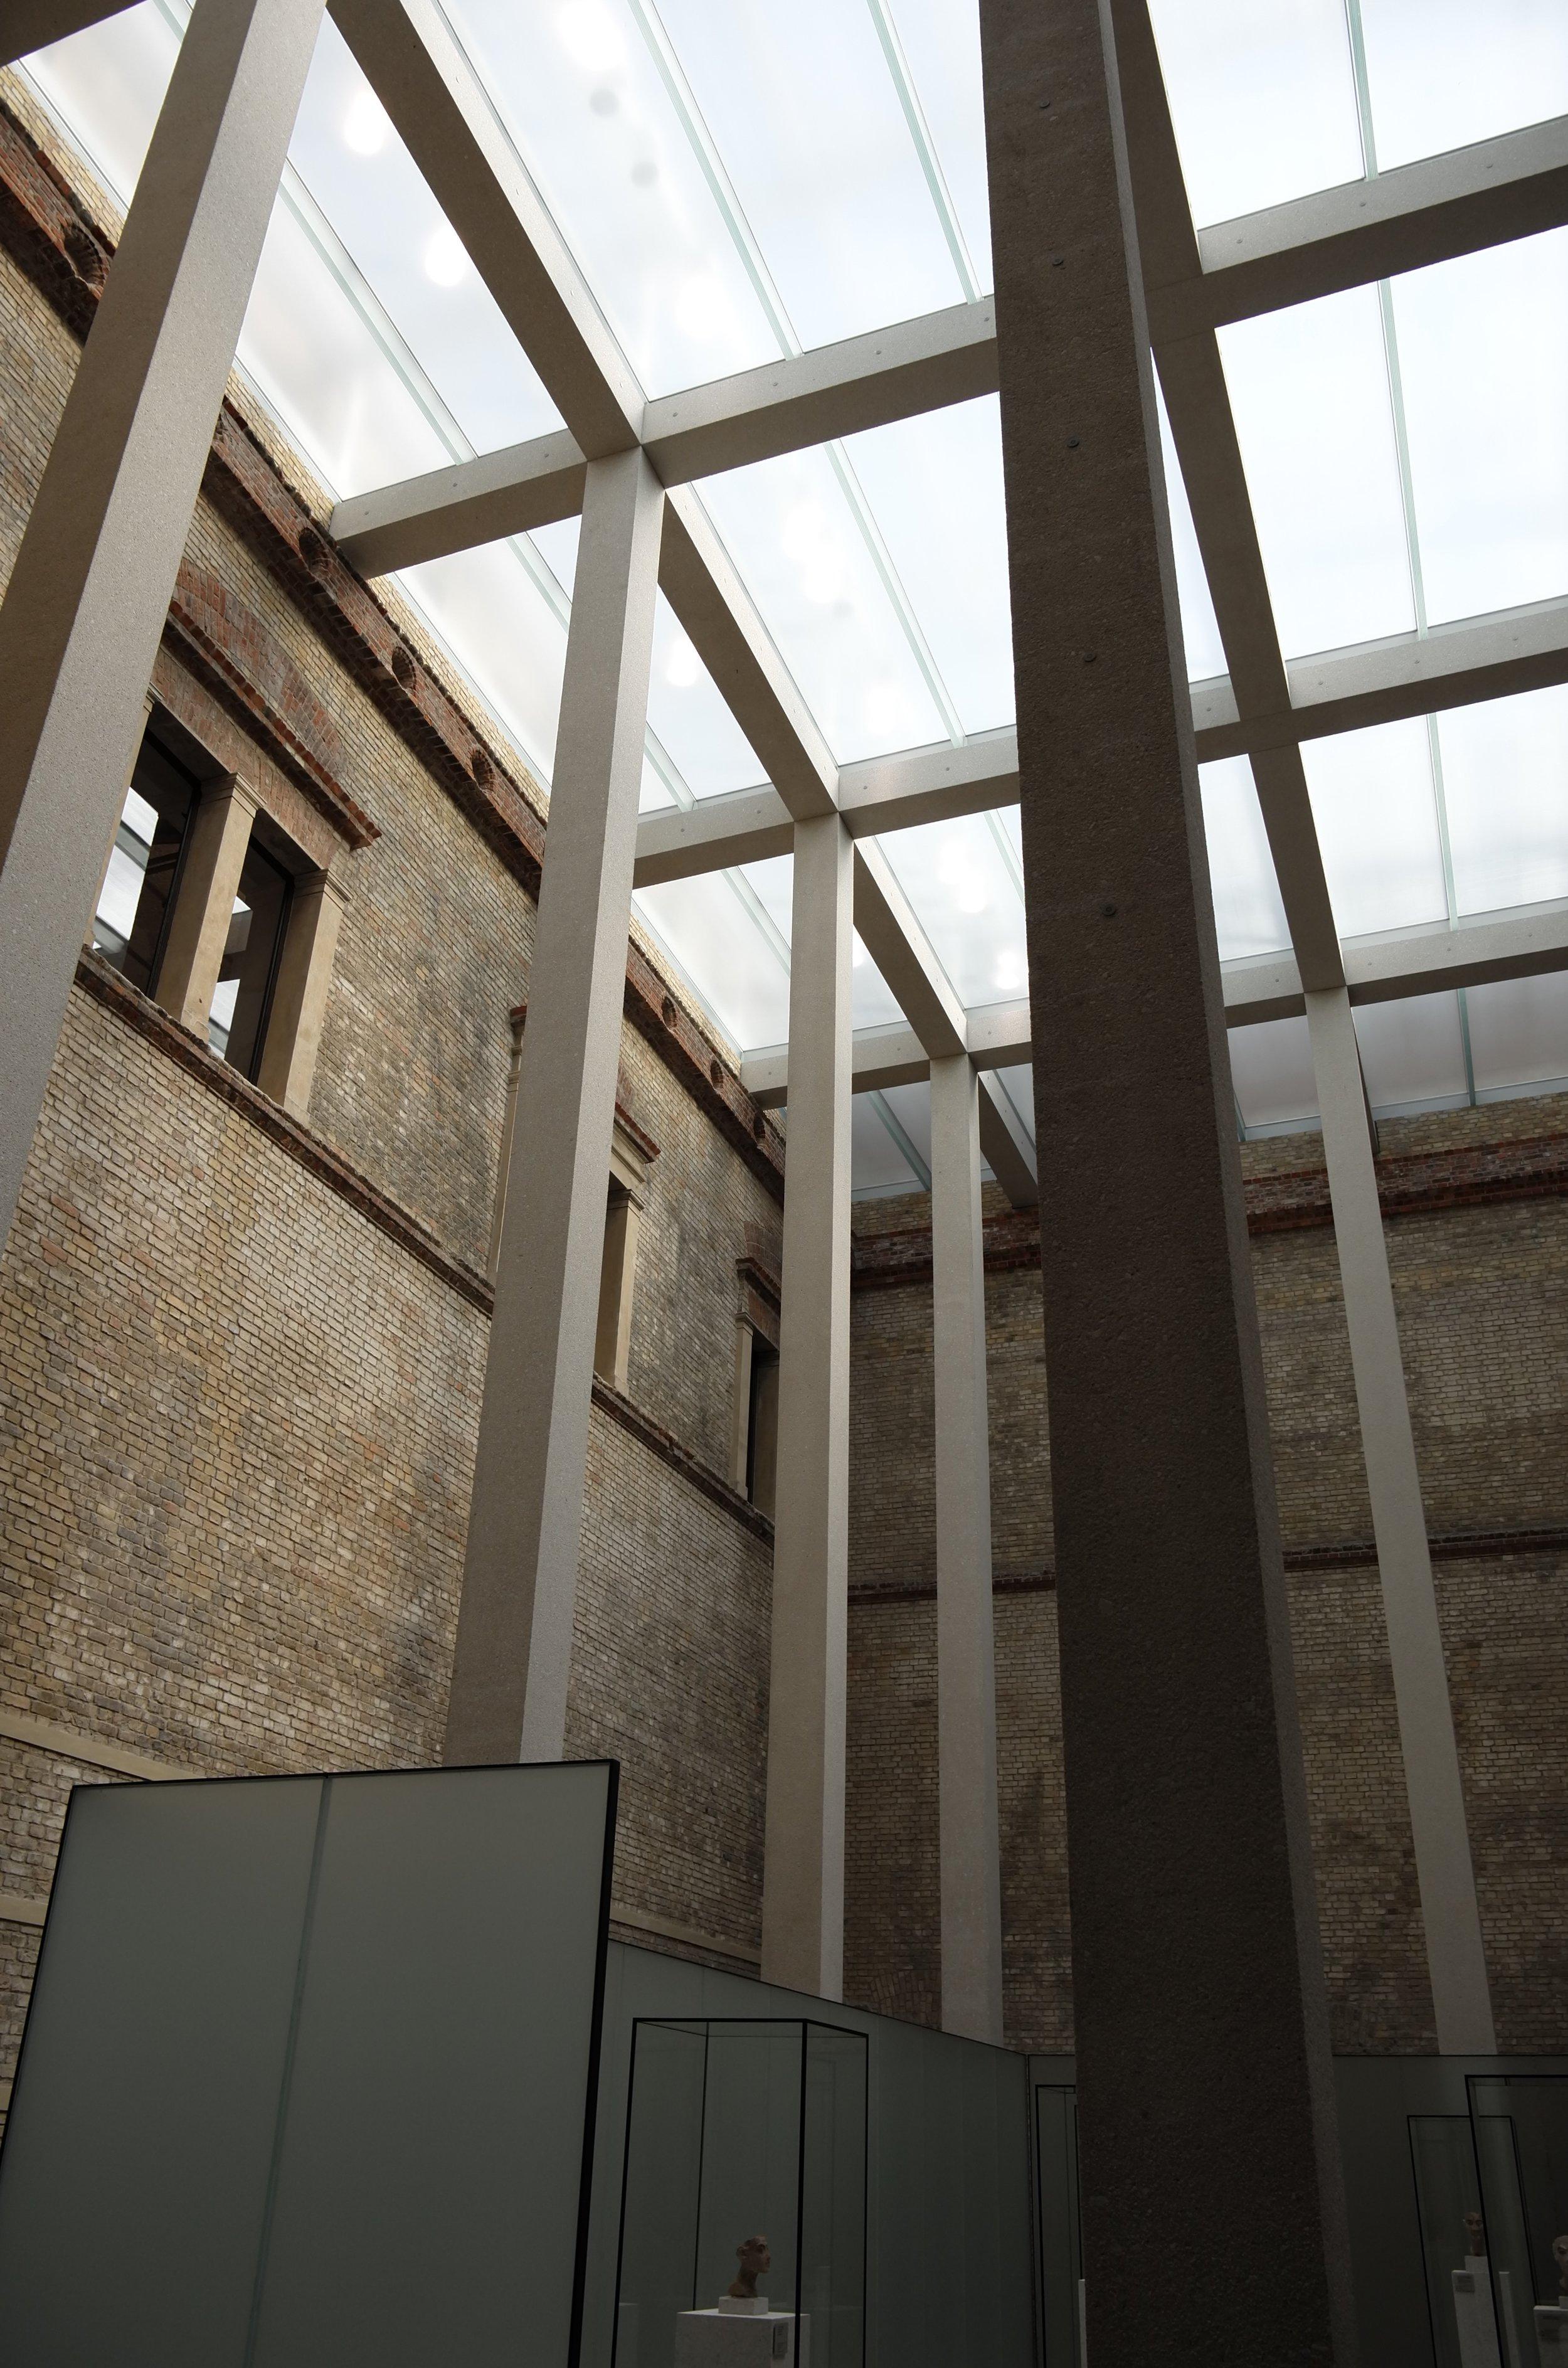 Neues Museum: Architecture Collections History, ed. Elke Blauert and Astrid Bahr. Staatliche Museen zu Berlin.